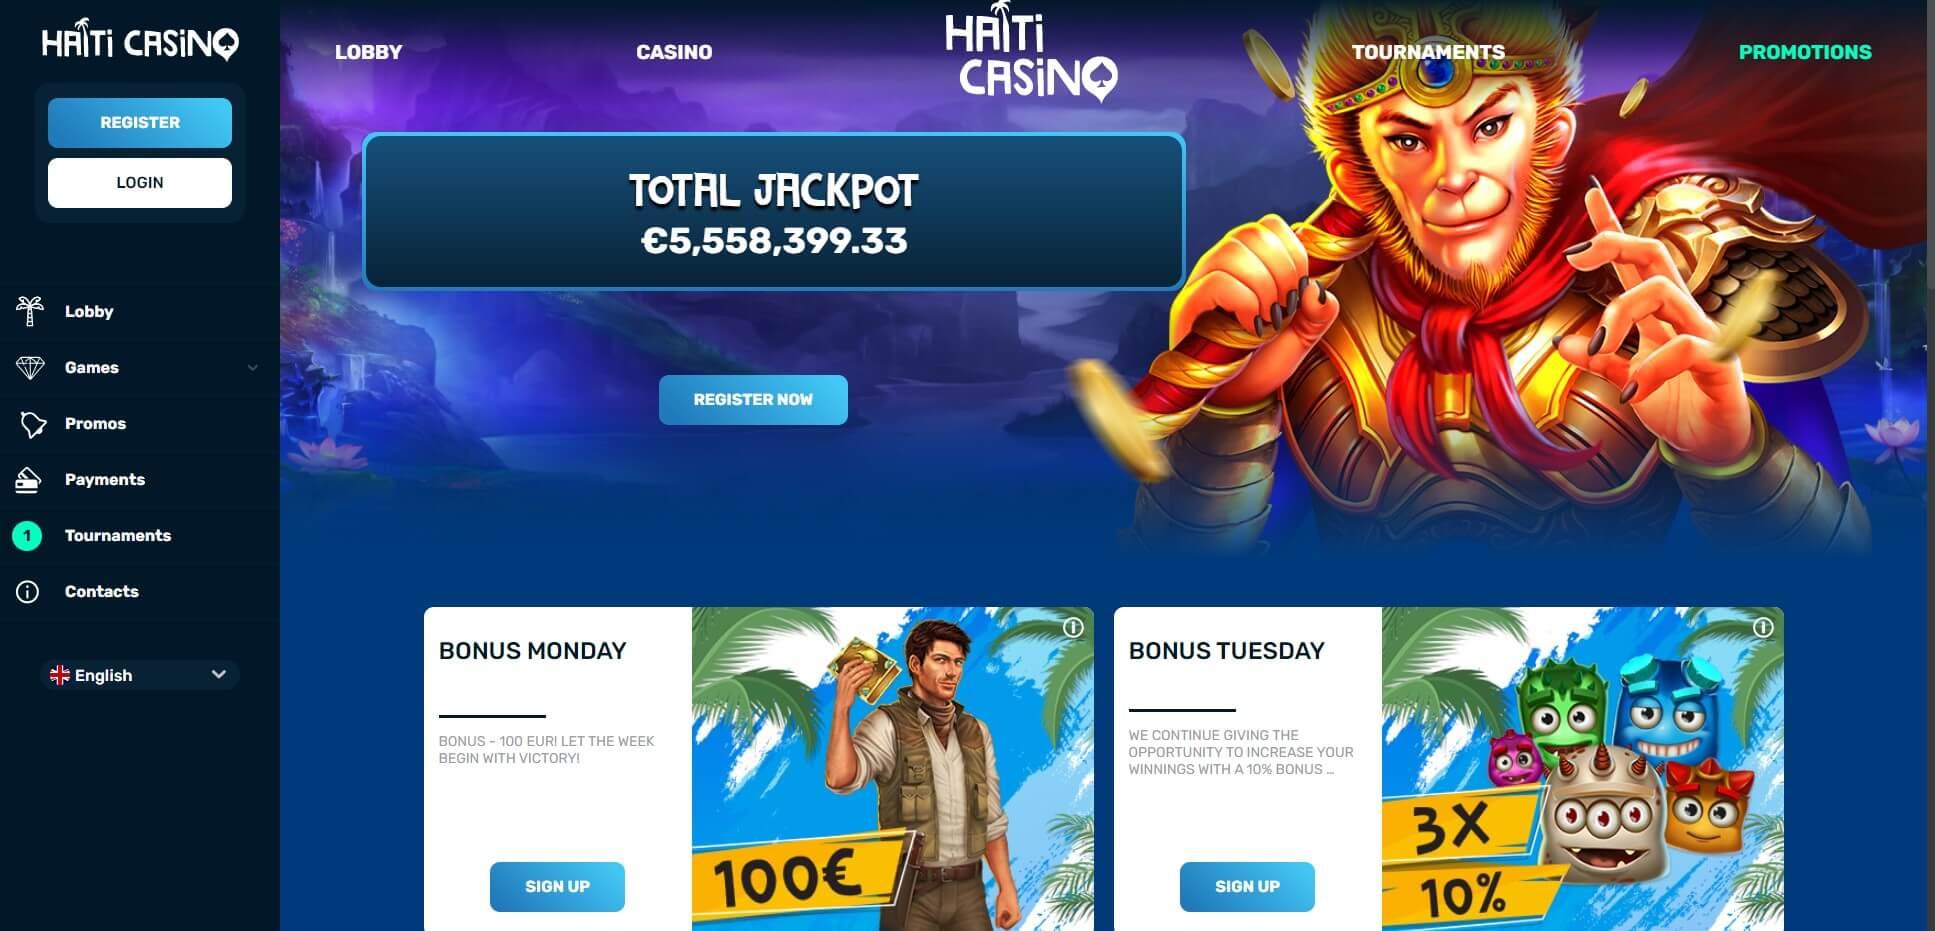 Promotions at Haiti Casino